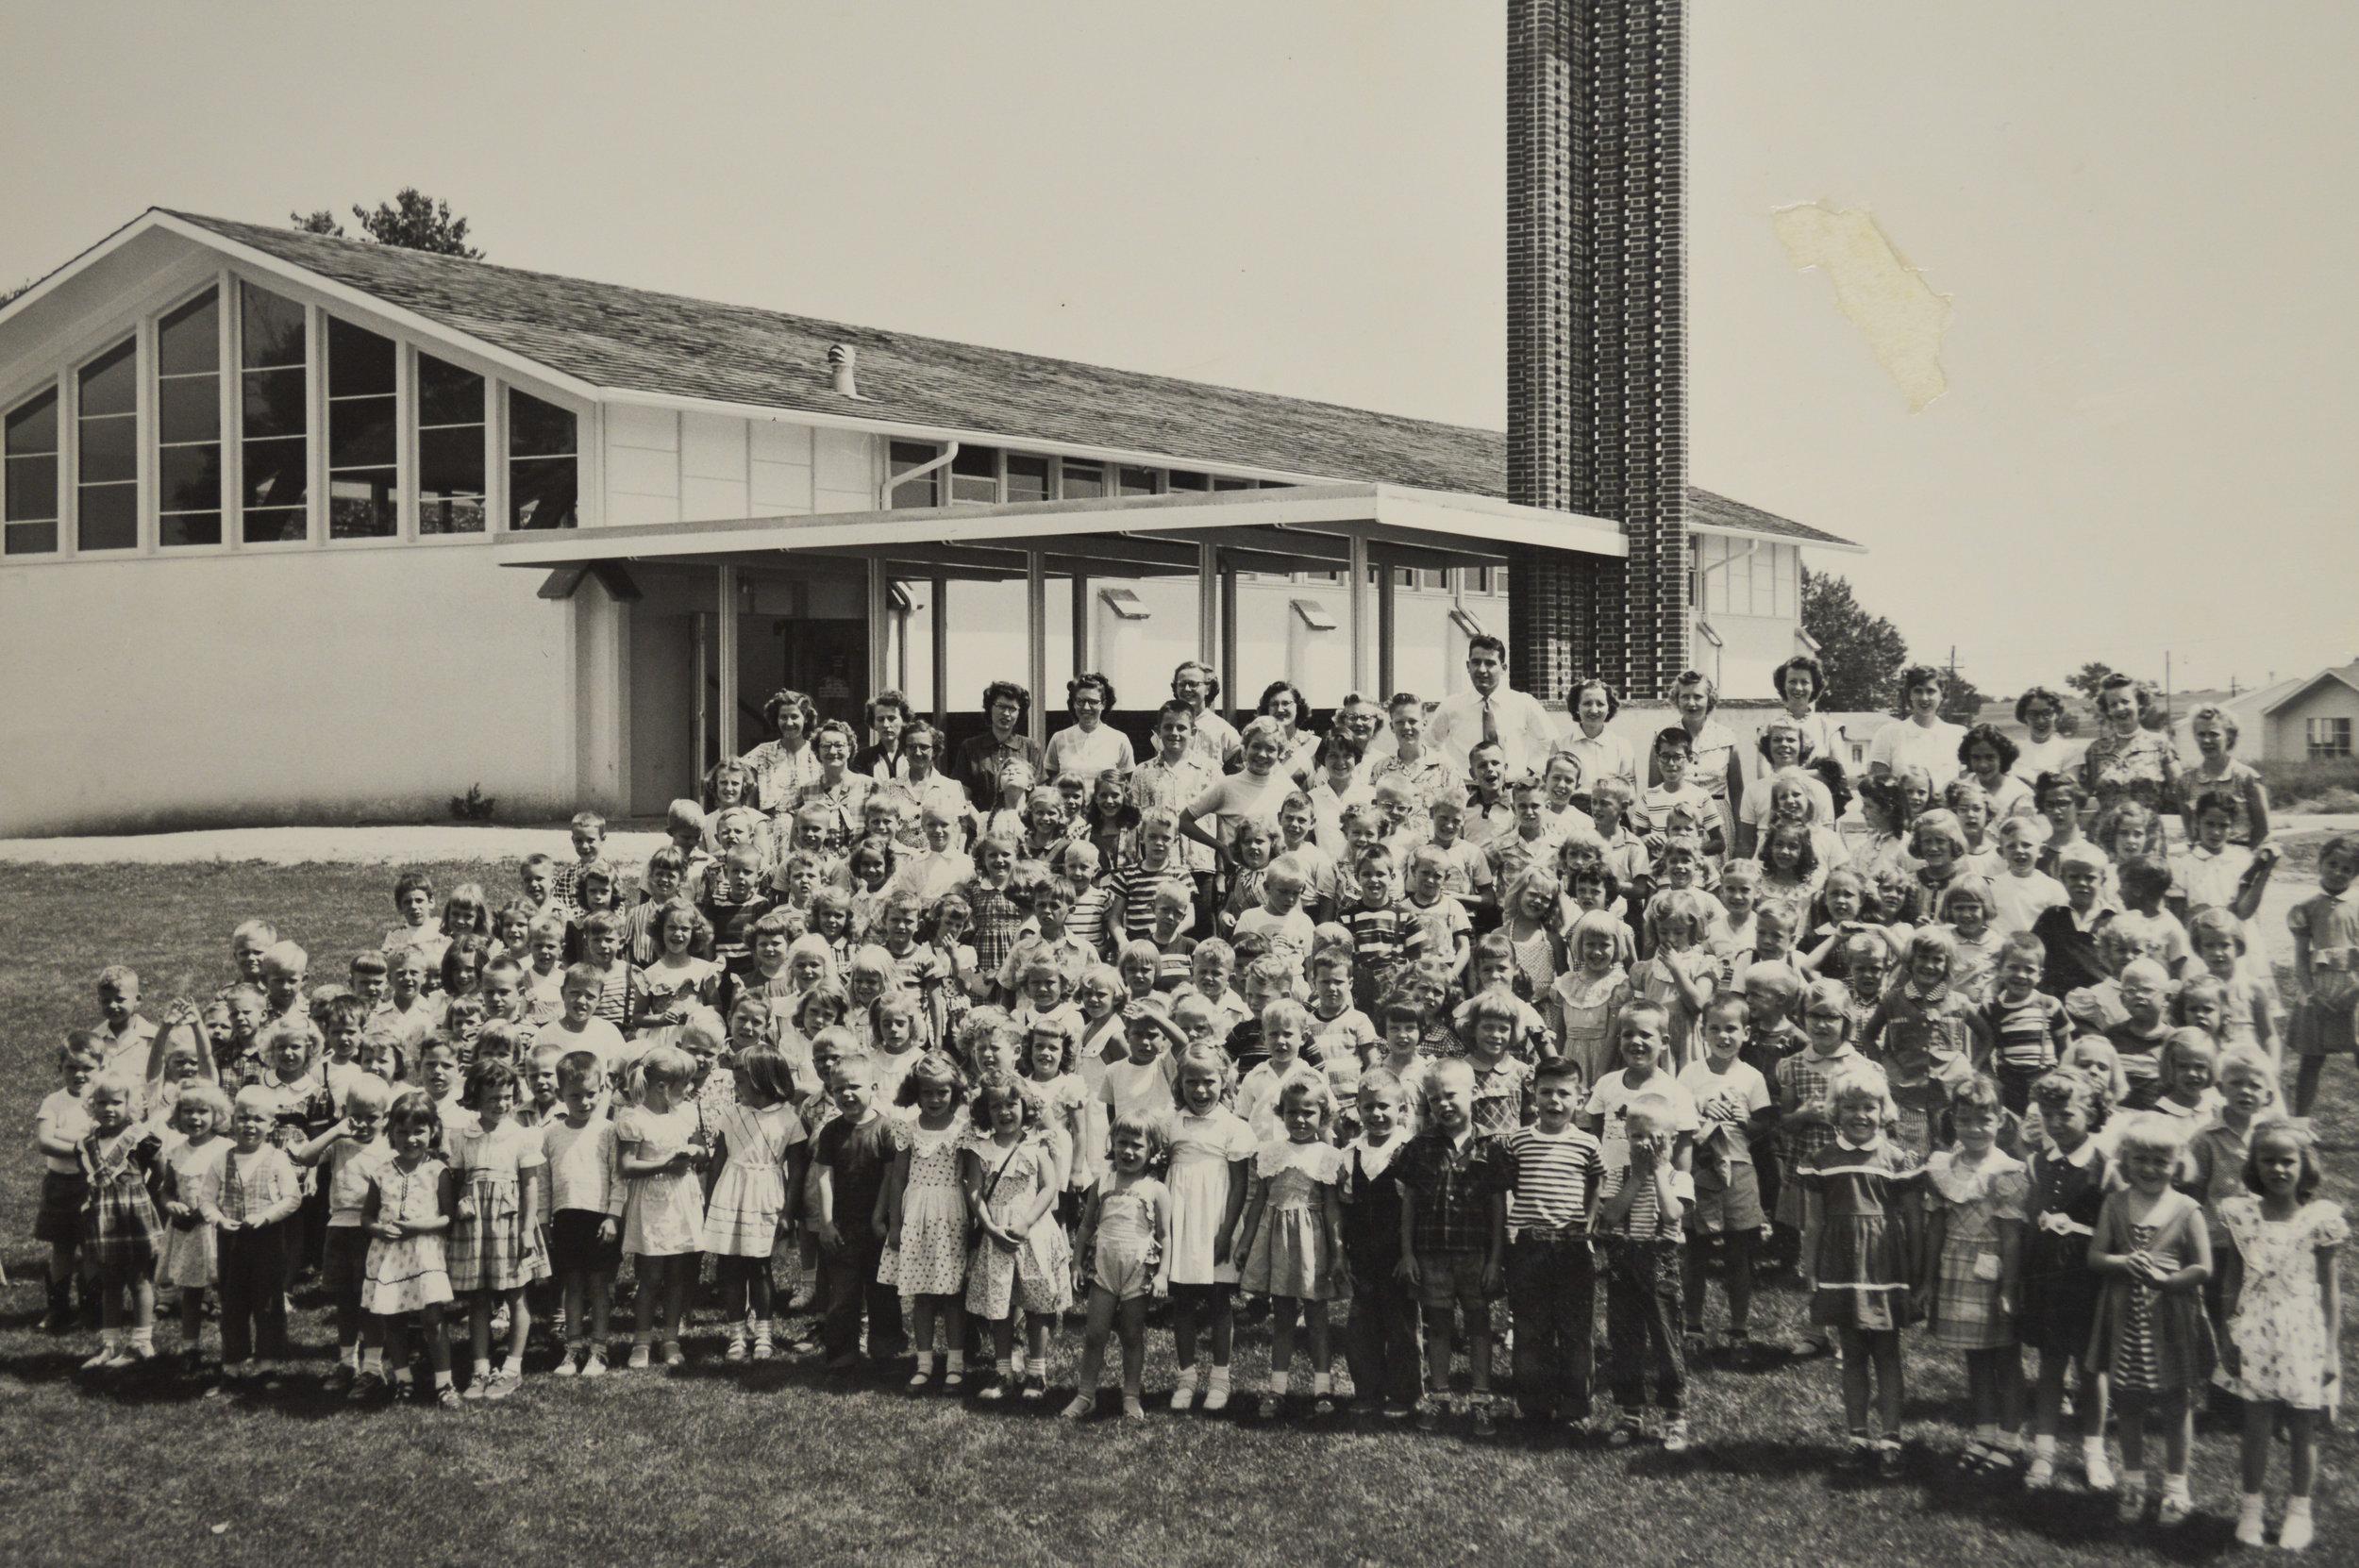 The first Sunday School, 1953.